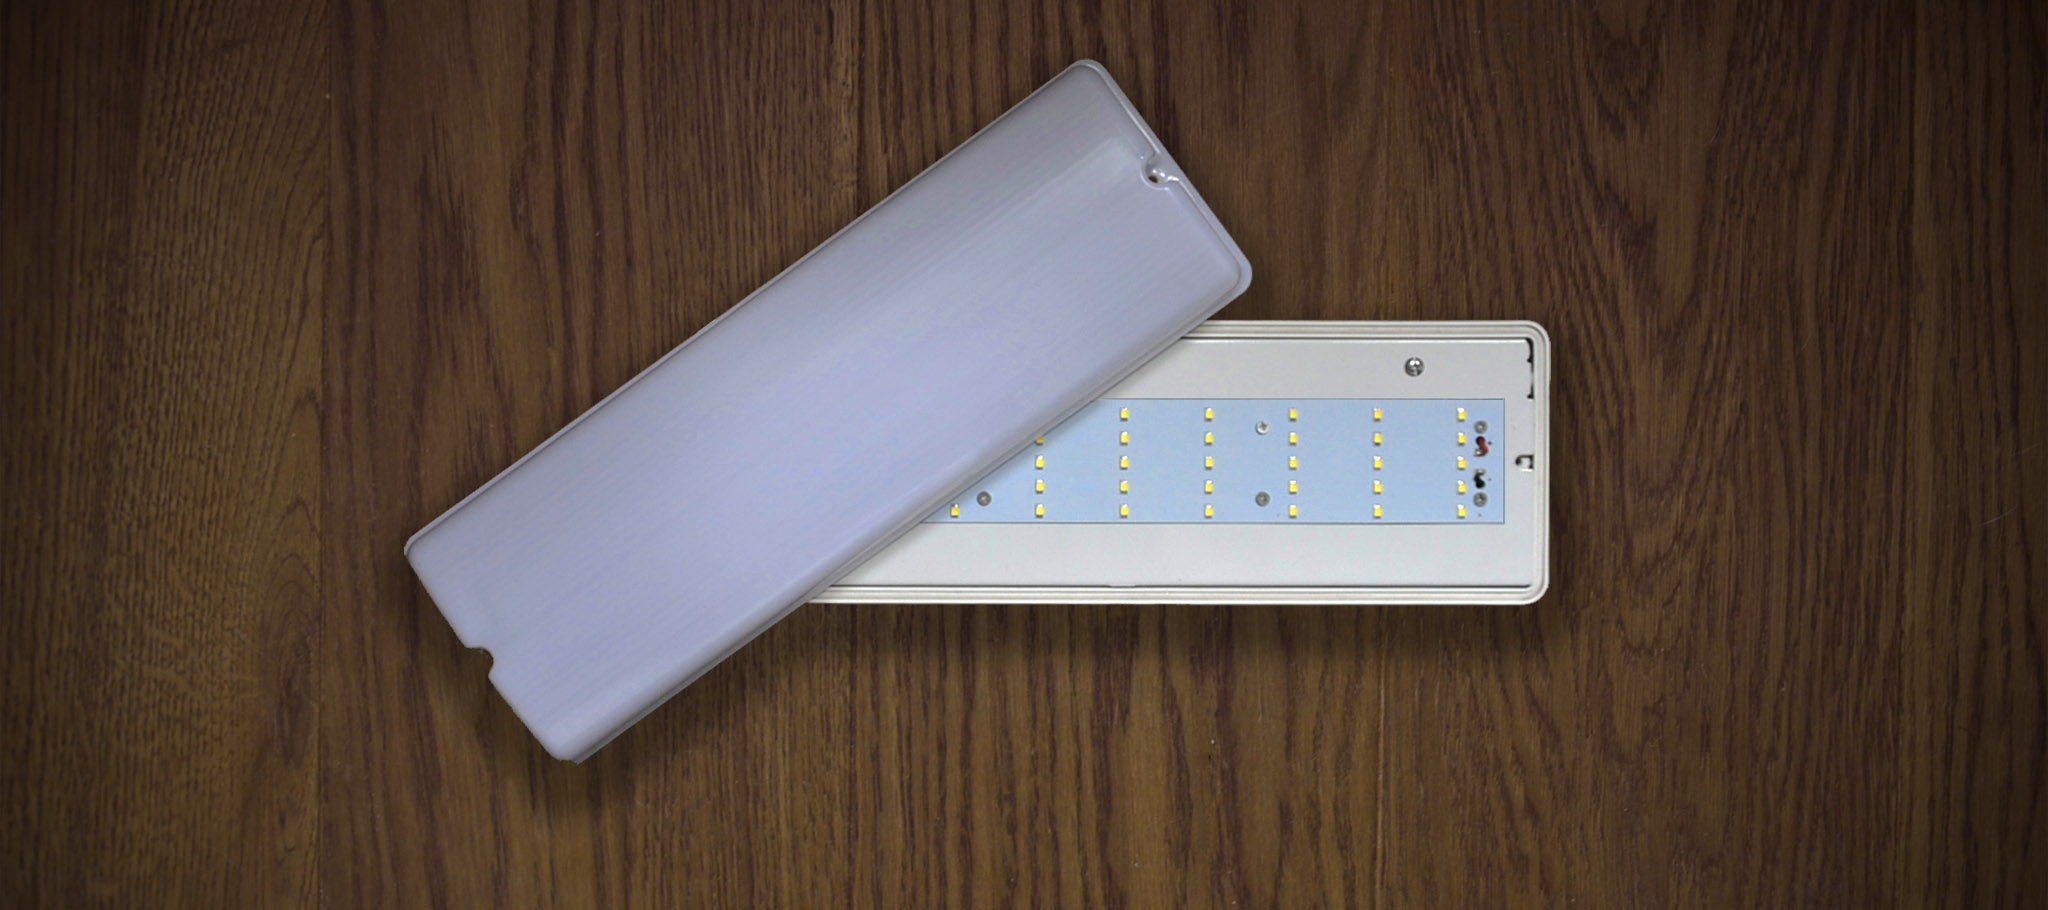 LED panik lampa za panik/nužnu rasvjetu